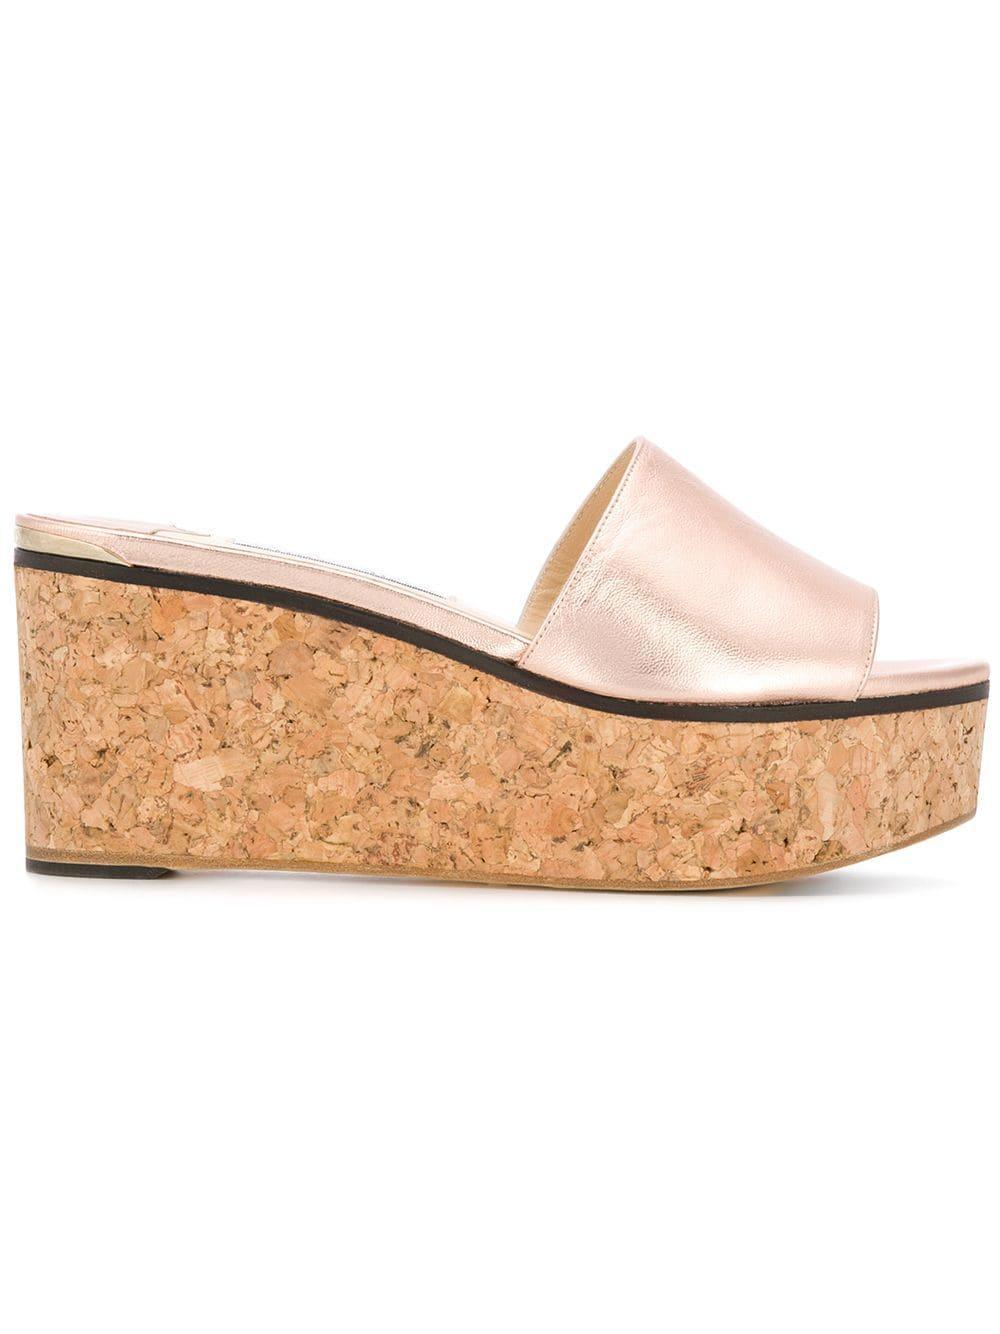 da4ff3617c4 Jimmy Choo Deedee 80 Tea Rose Metallic Nappa Leather Sandal Wedges In Pink